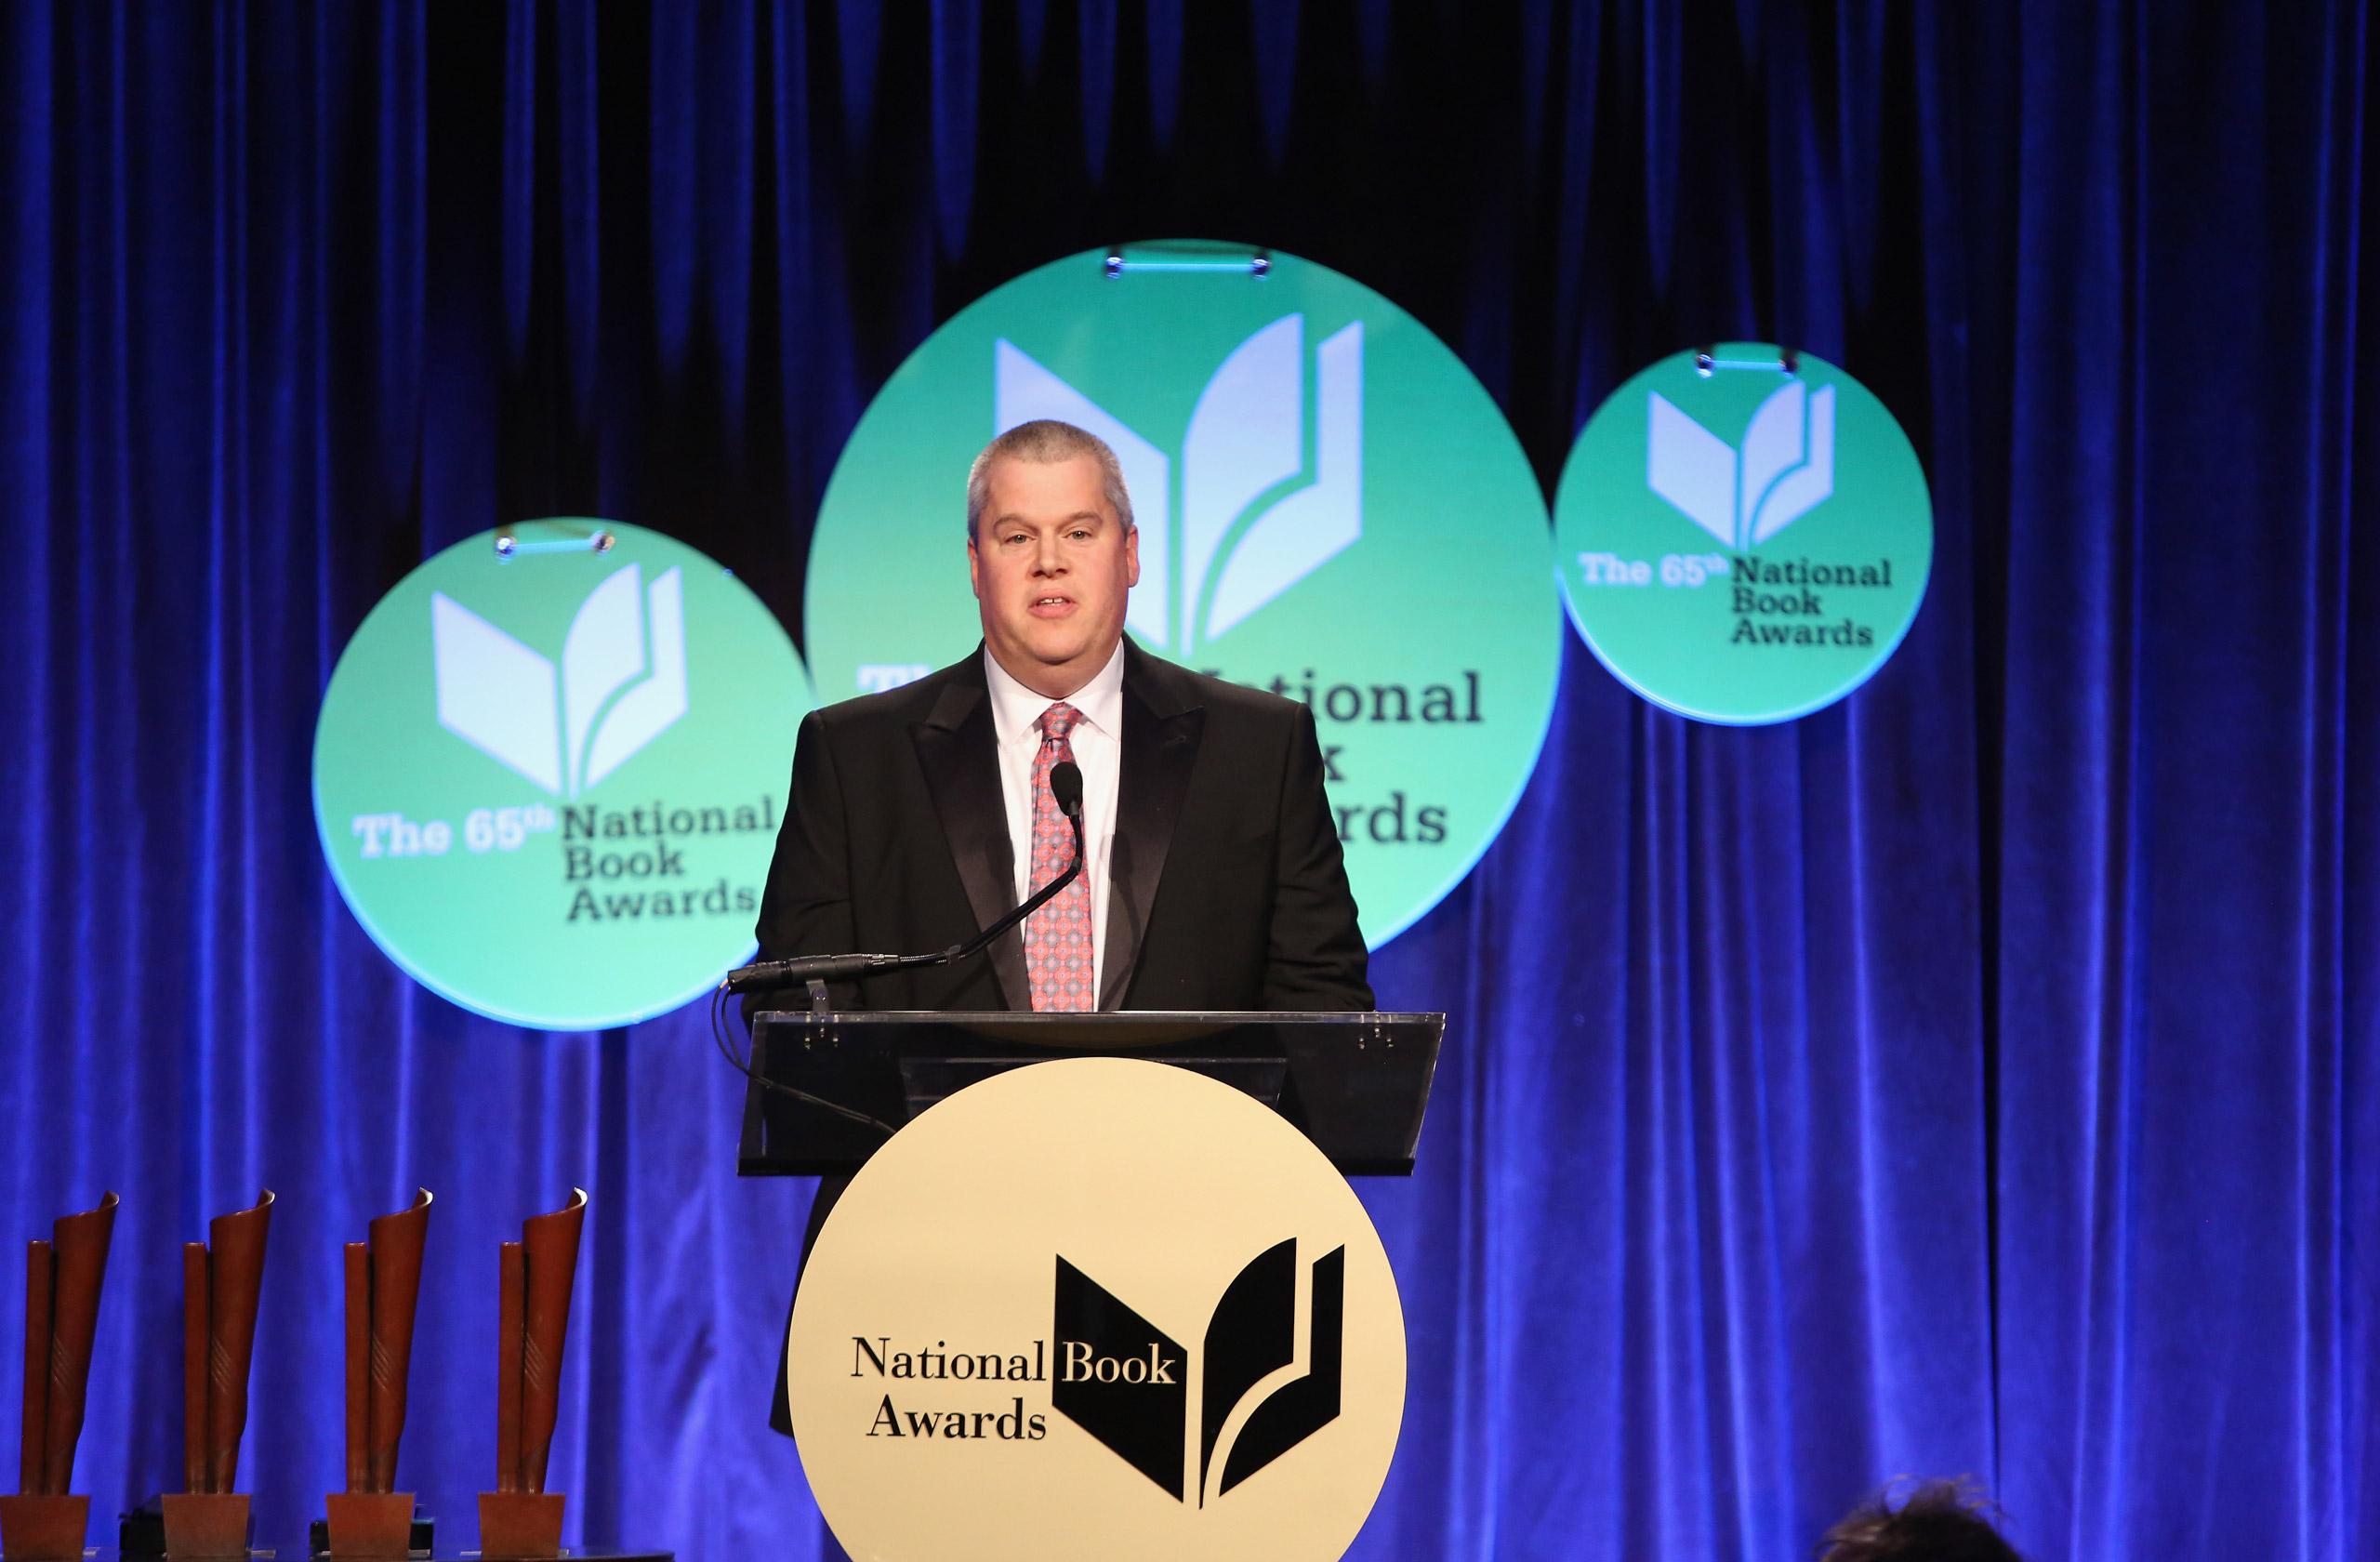 Daniel Handler attends the 2014 National Book Awards ceremony in New York on Nov. 19, 2014.